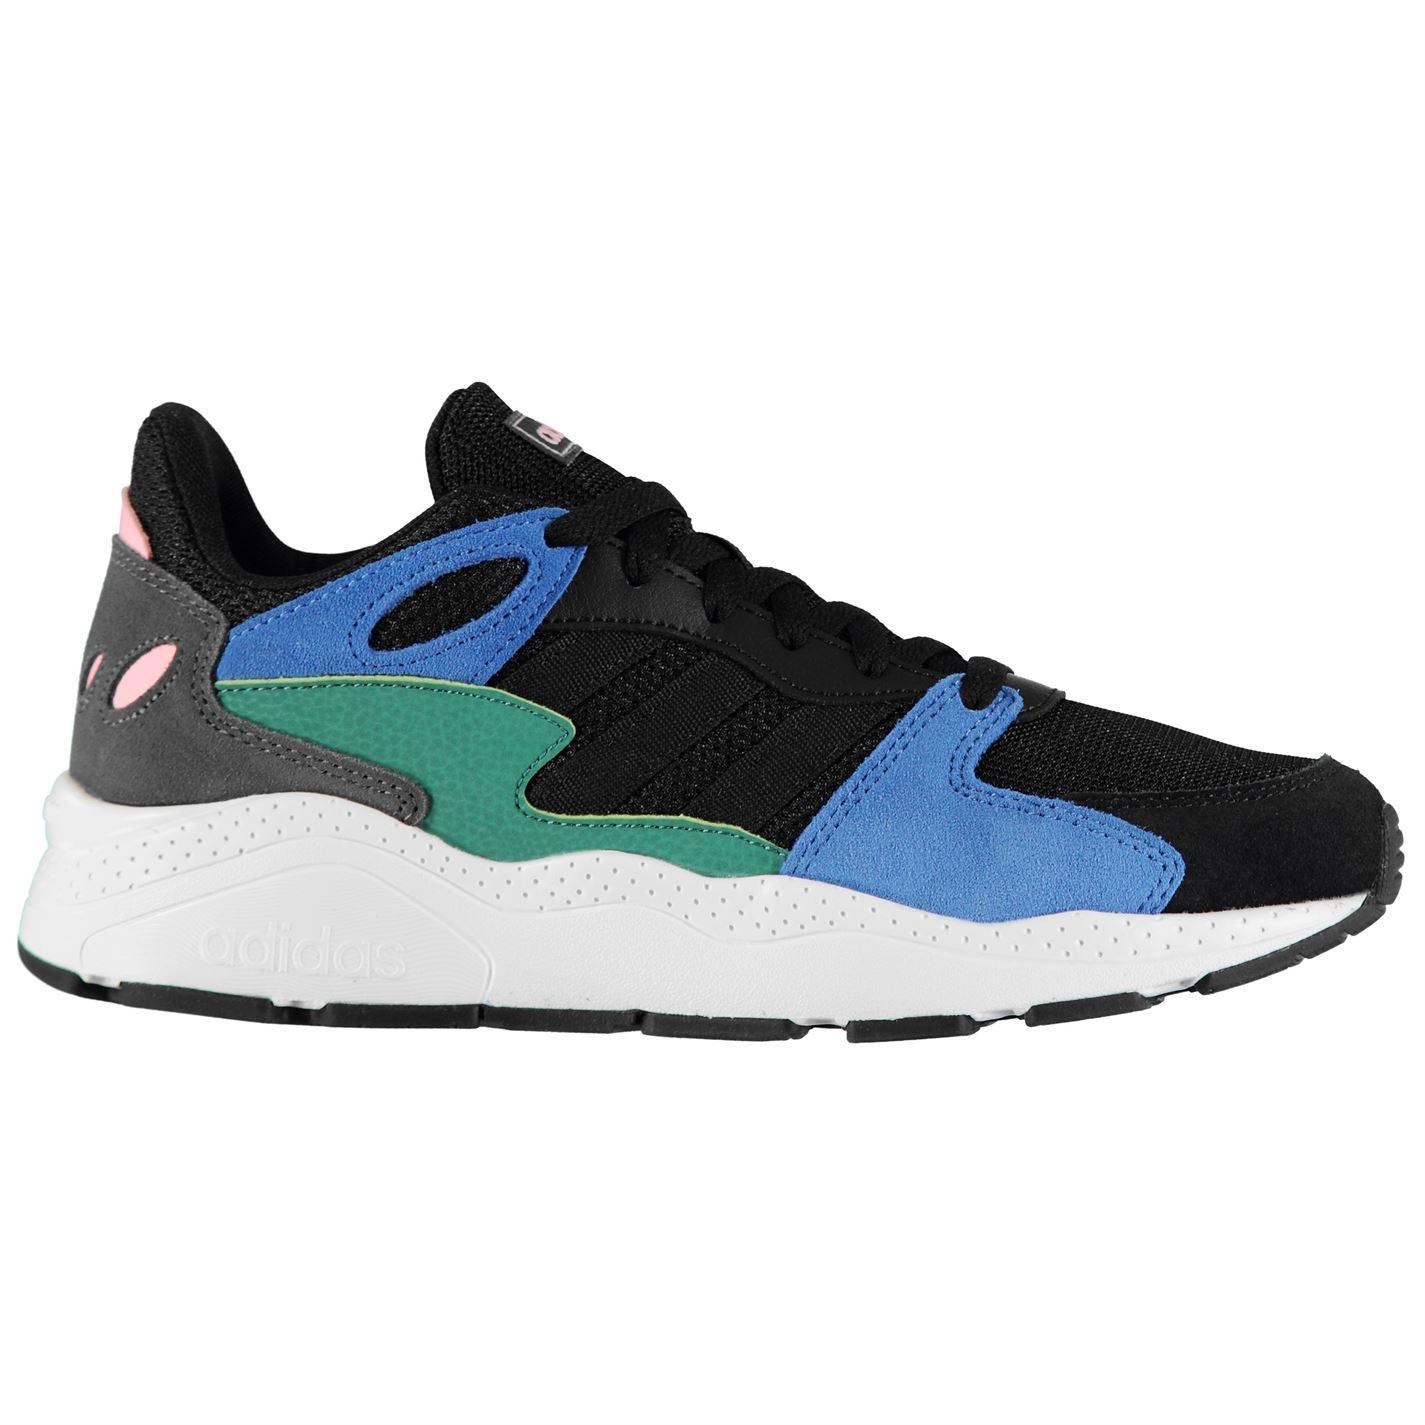 Adidas-Crazychaos-Baskets-Homme-Chaussures-De-Loisirs-Chaussures-Baskets miniature 14